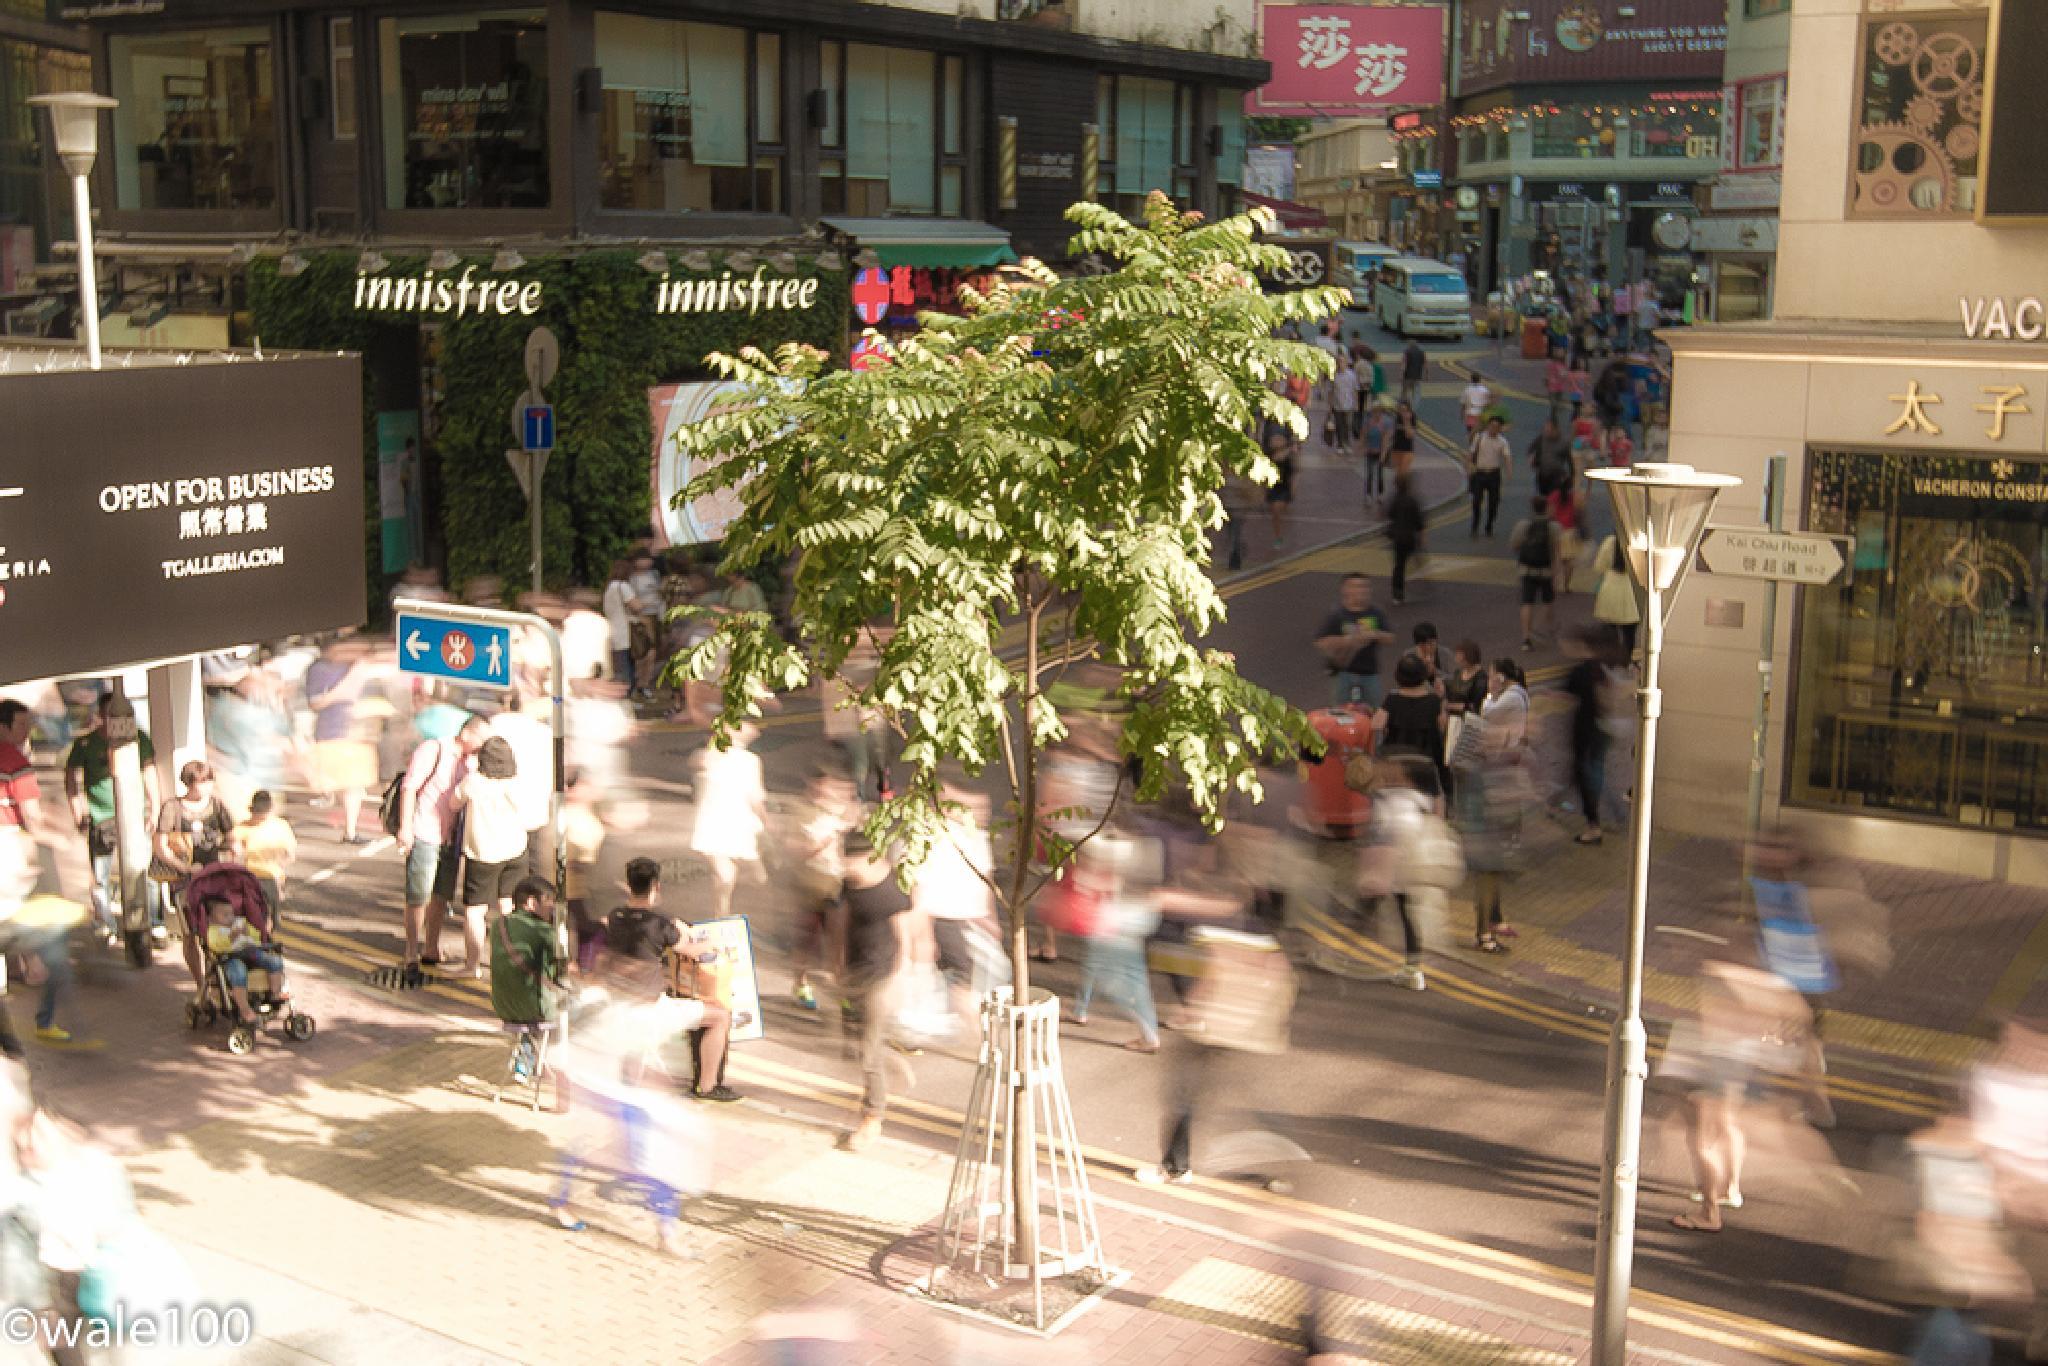 People watching in Hong Kong by wale